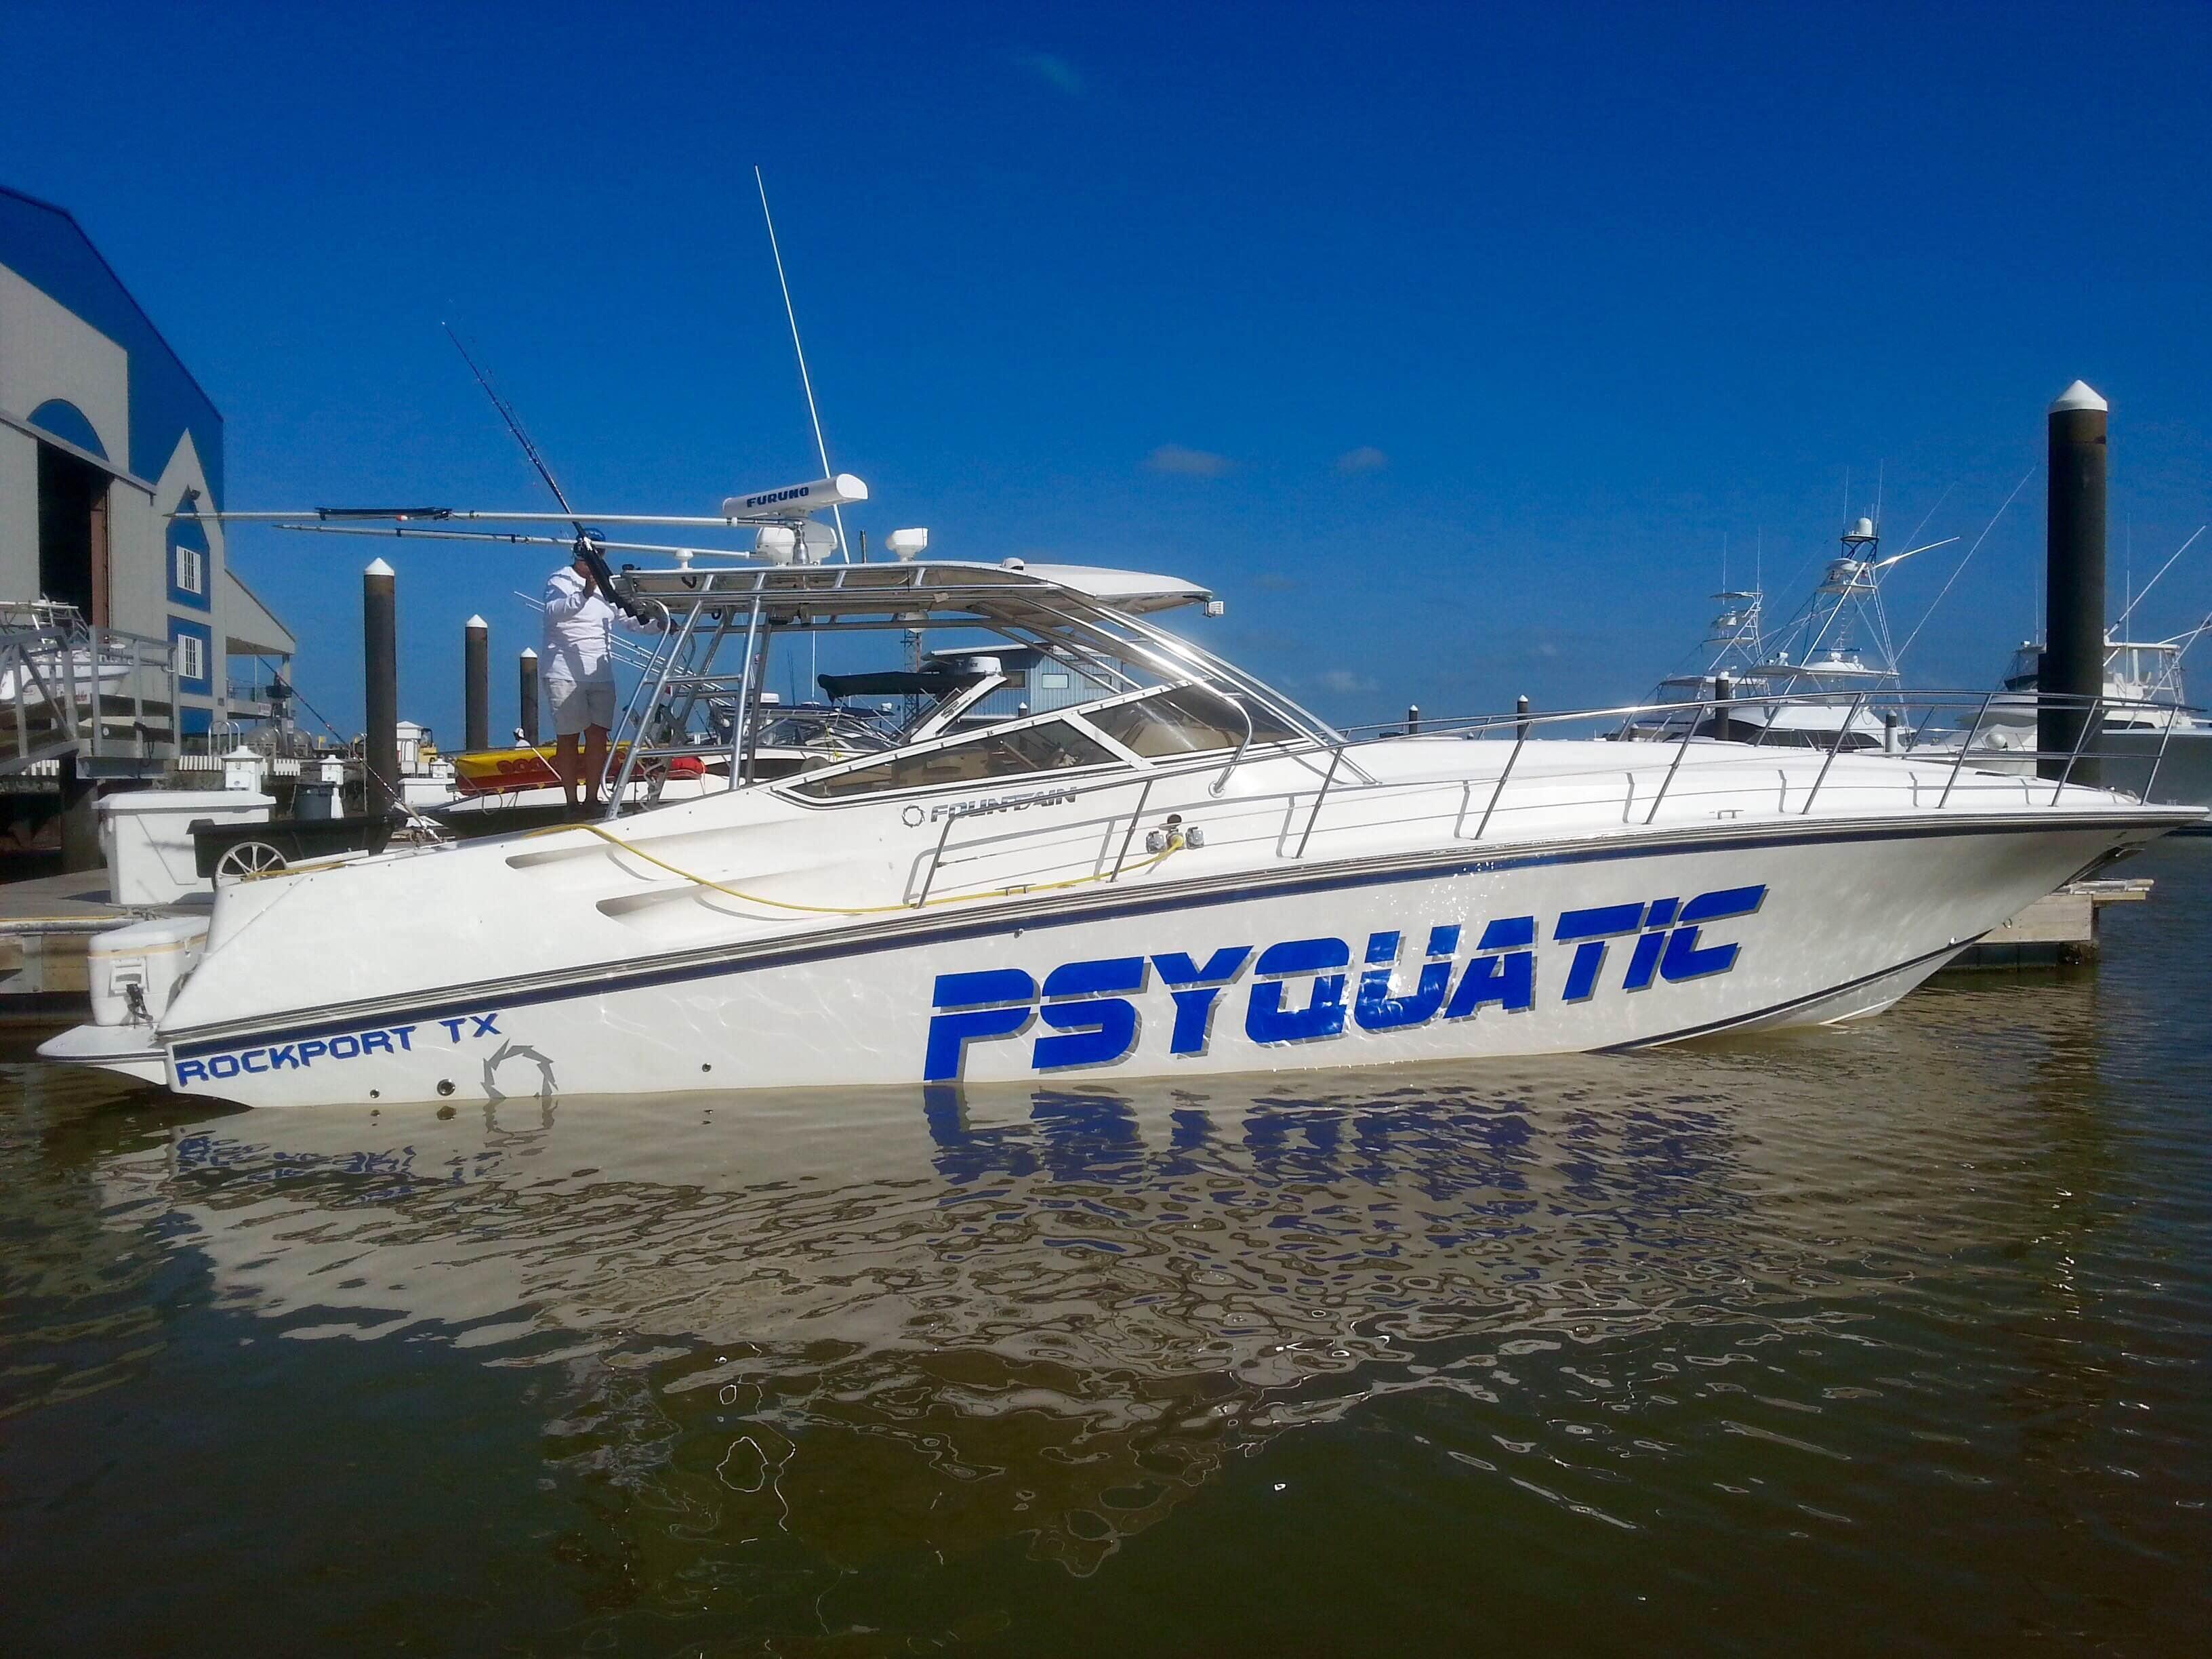 How To Calculate Miles Per Gallon >> 2006 Fountain 38 Sportfish Cruiser Power Boat For Sale ...